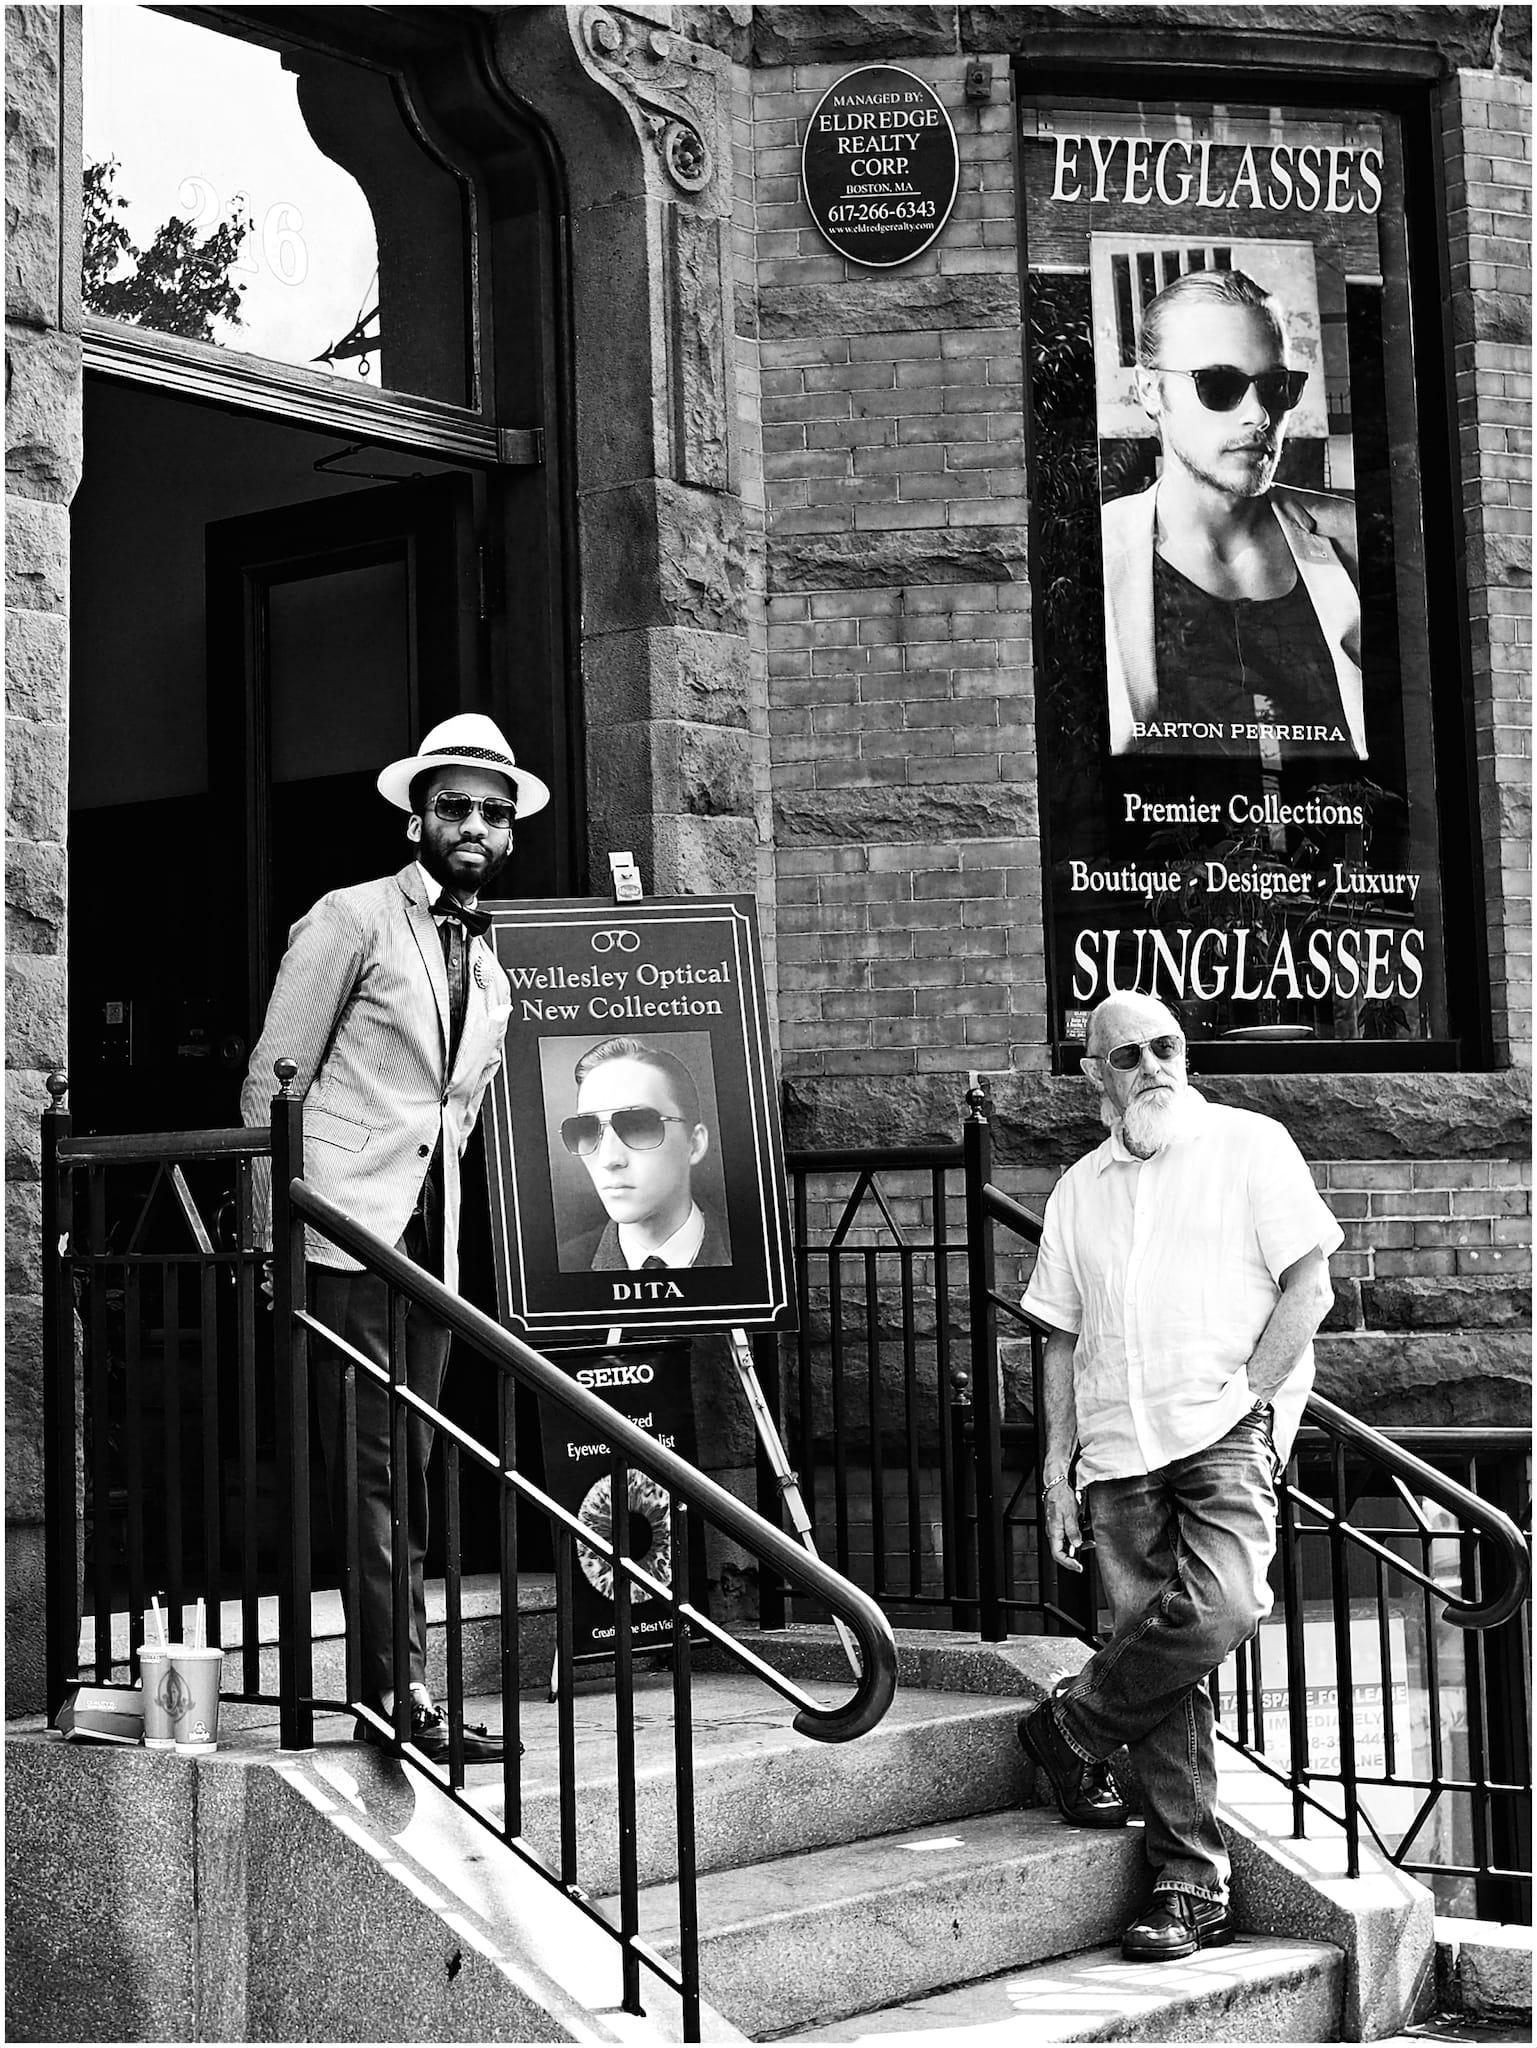 """8 Eyes"" by Philip Salgannik. Shot in Newbury Street, Boston, MA, USA, July, 2014"